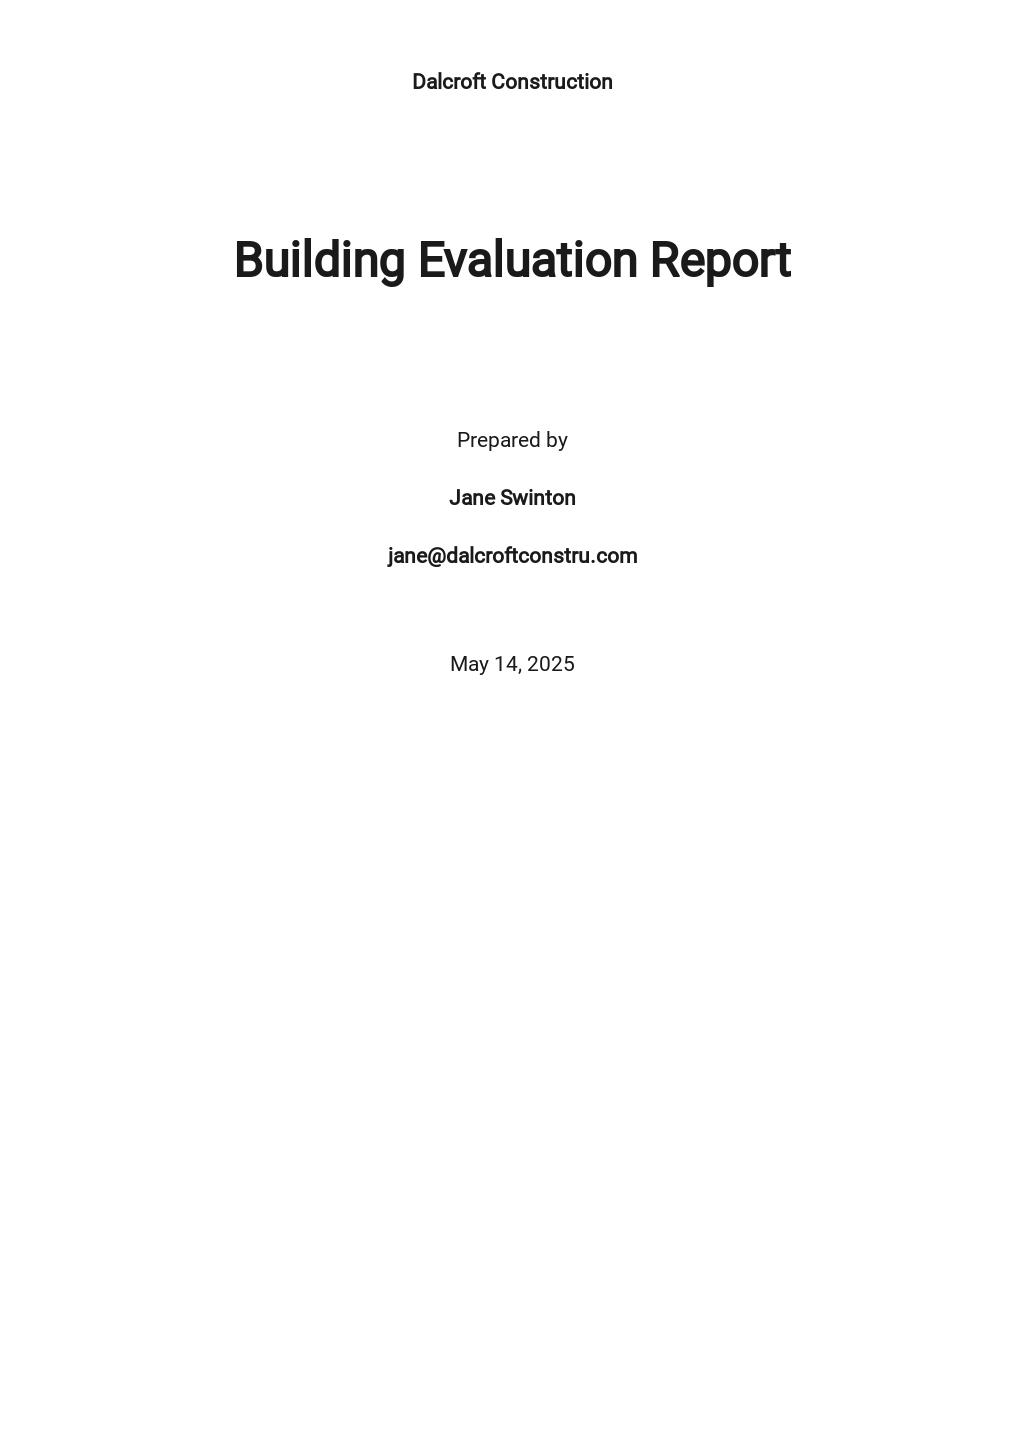 Building Evaluation Report Template